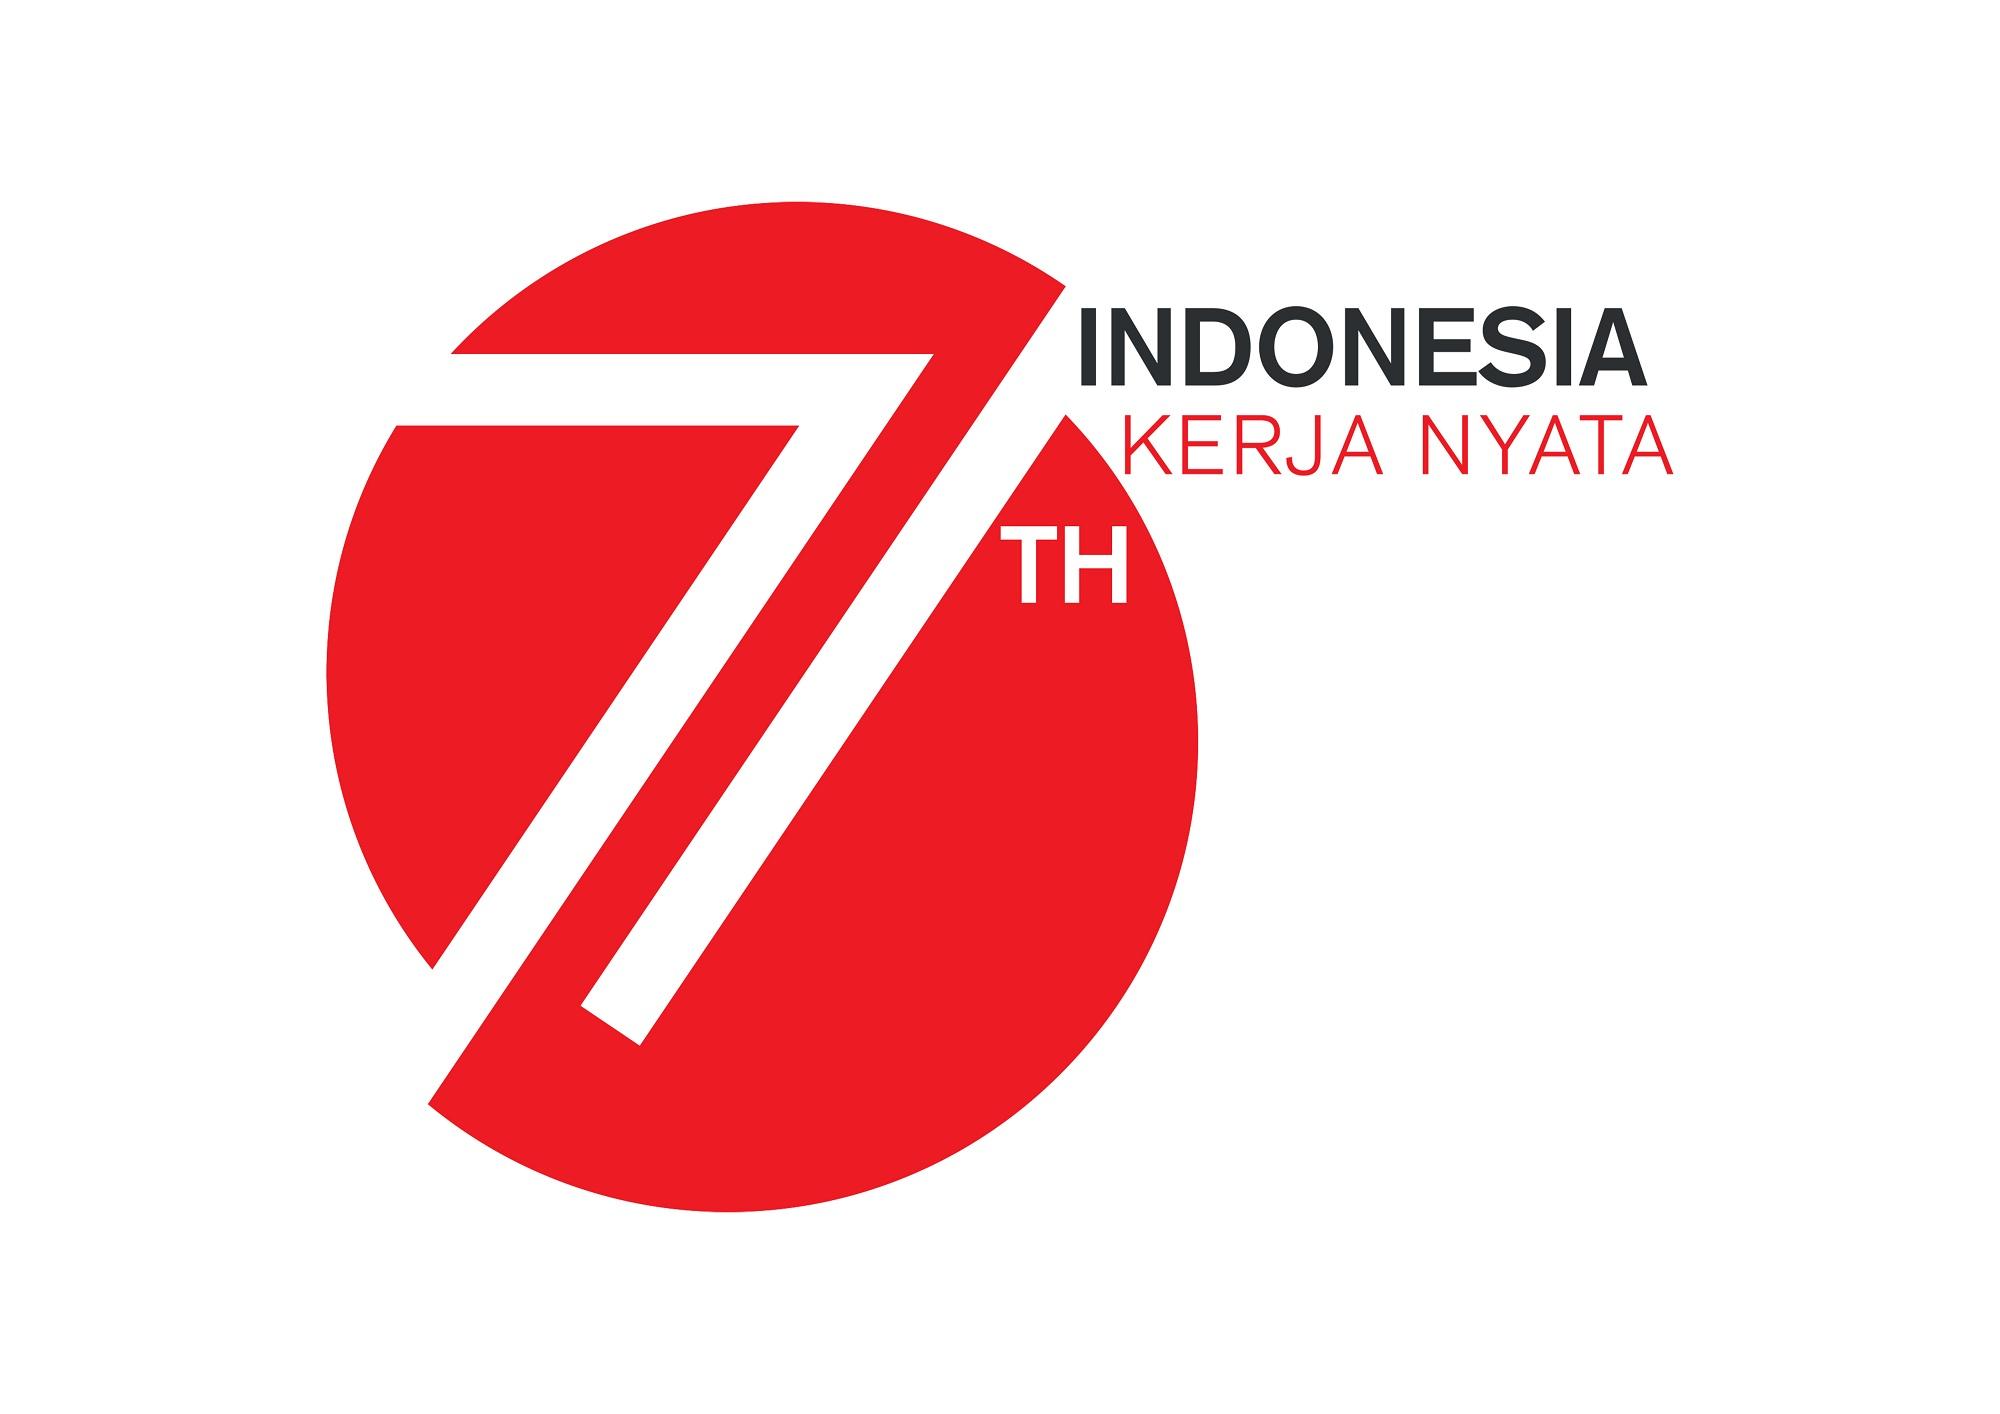 Logo HUT RI ke-71 diduga menjiplak logo ini!